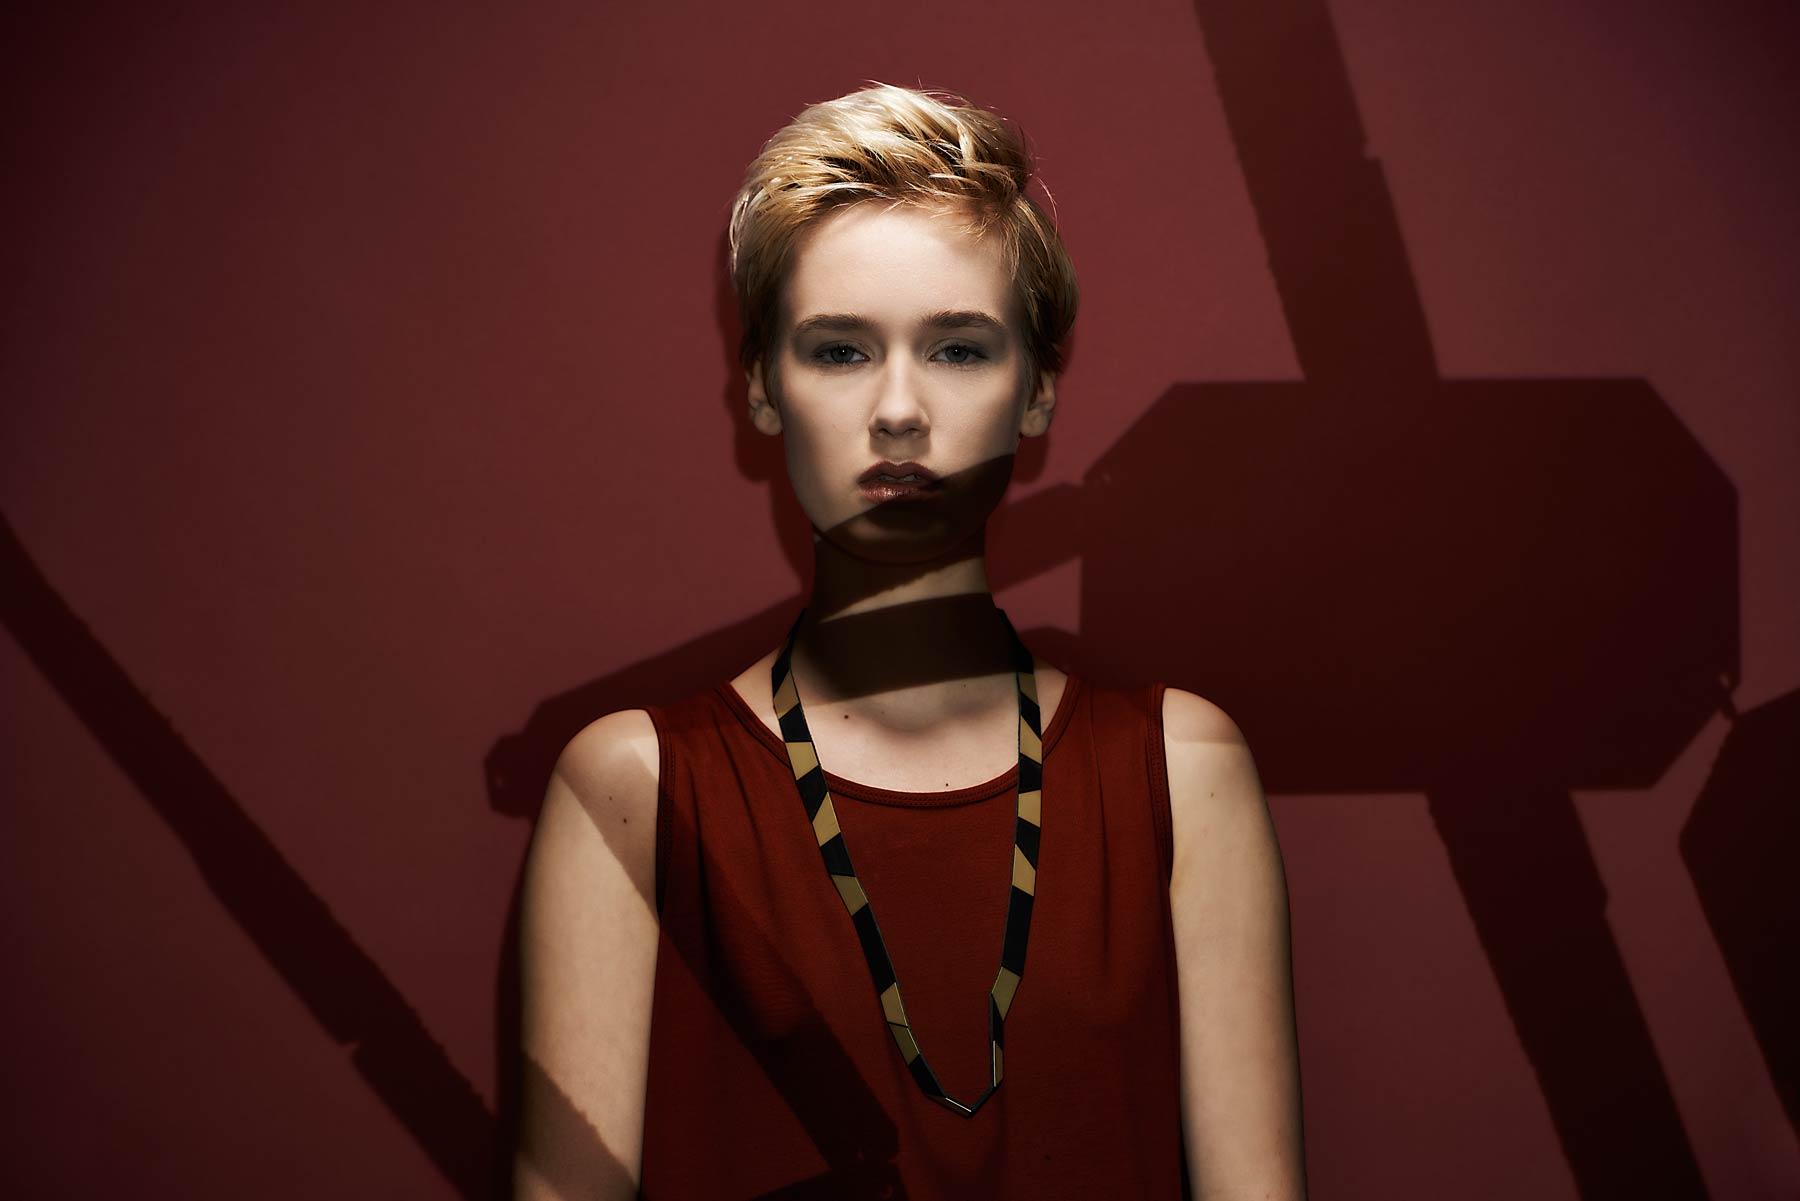 Maren Duesel 2014-03.07-people-jewellery-duesel6008